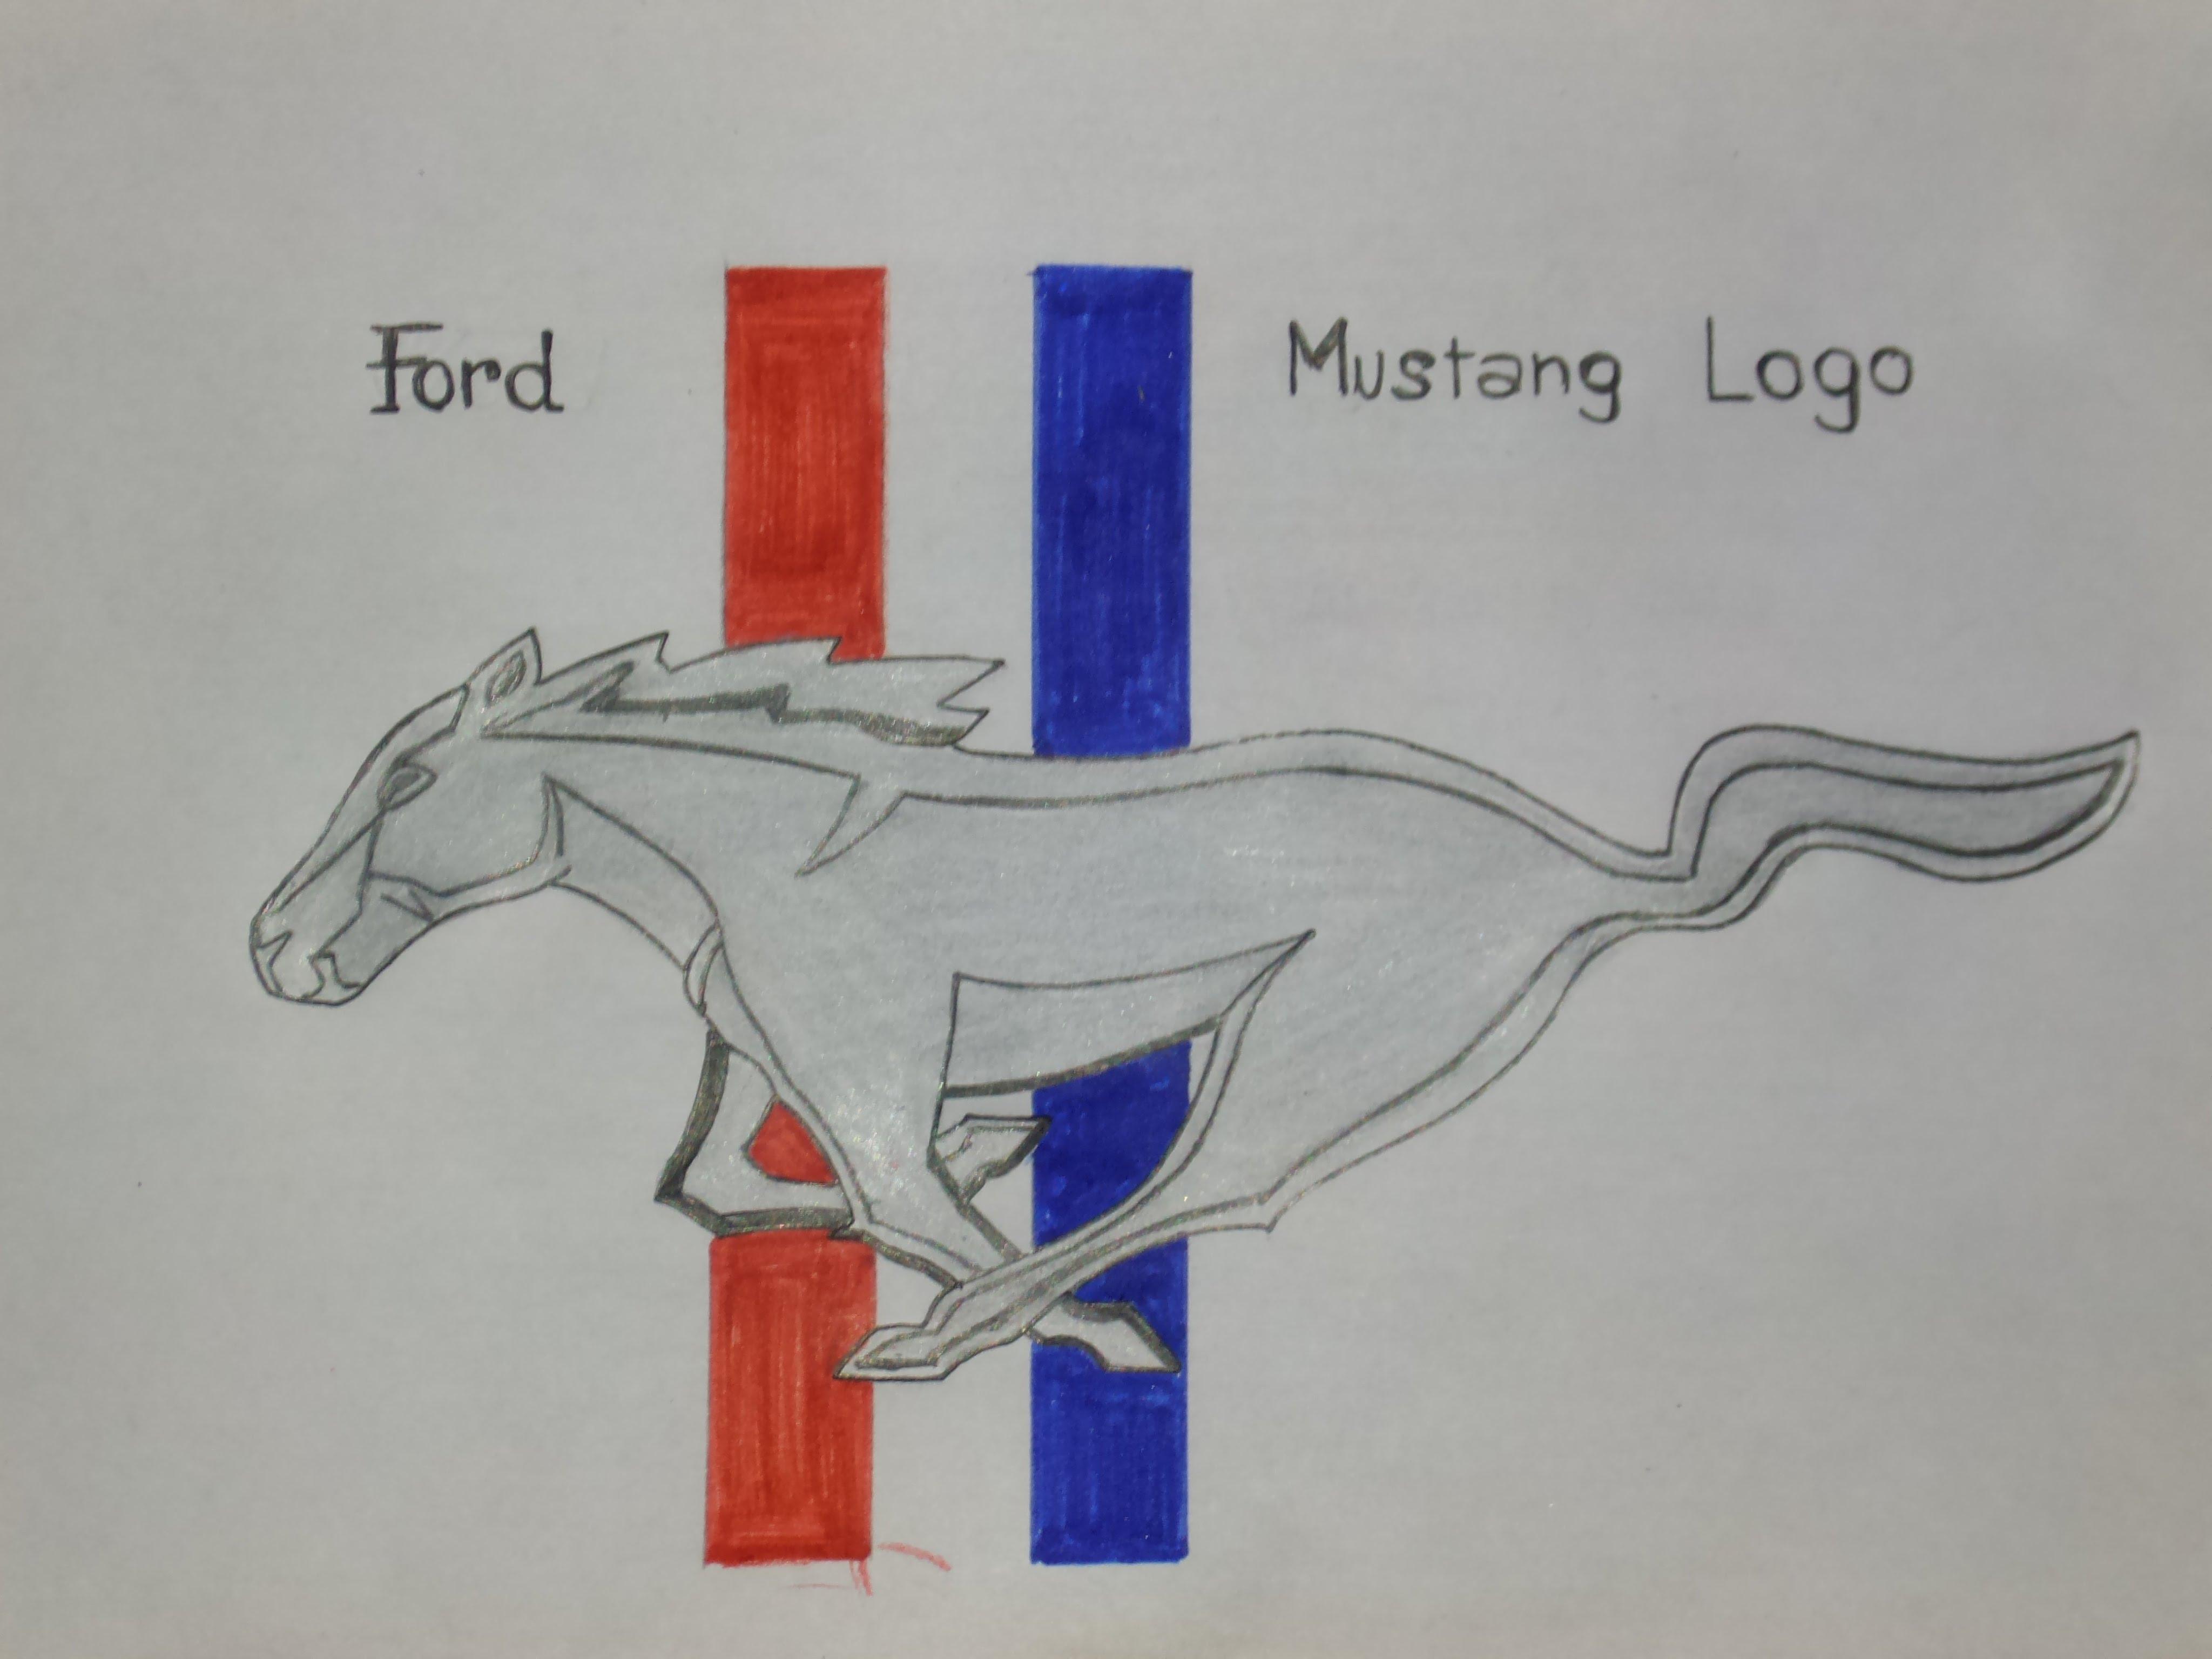 4096x3072 Ford Mustang Logo Drawing